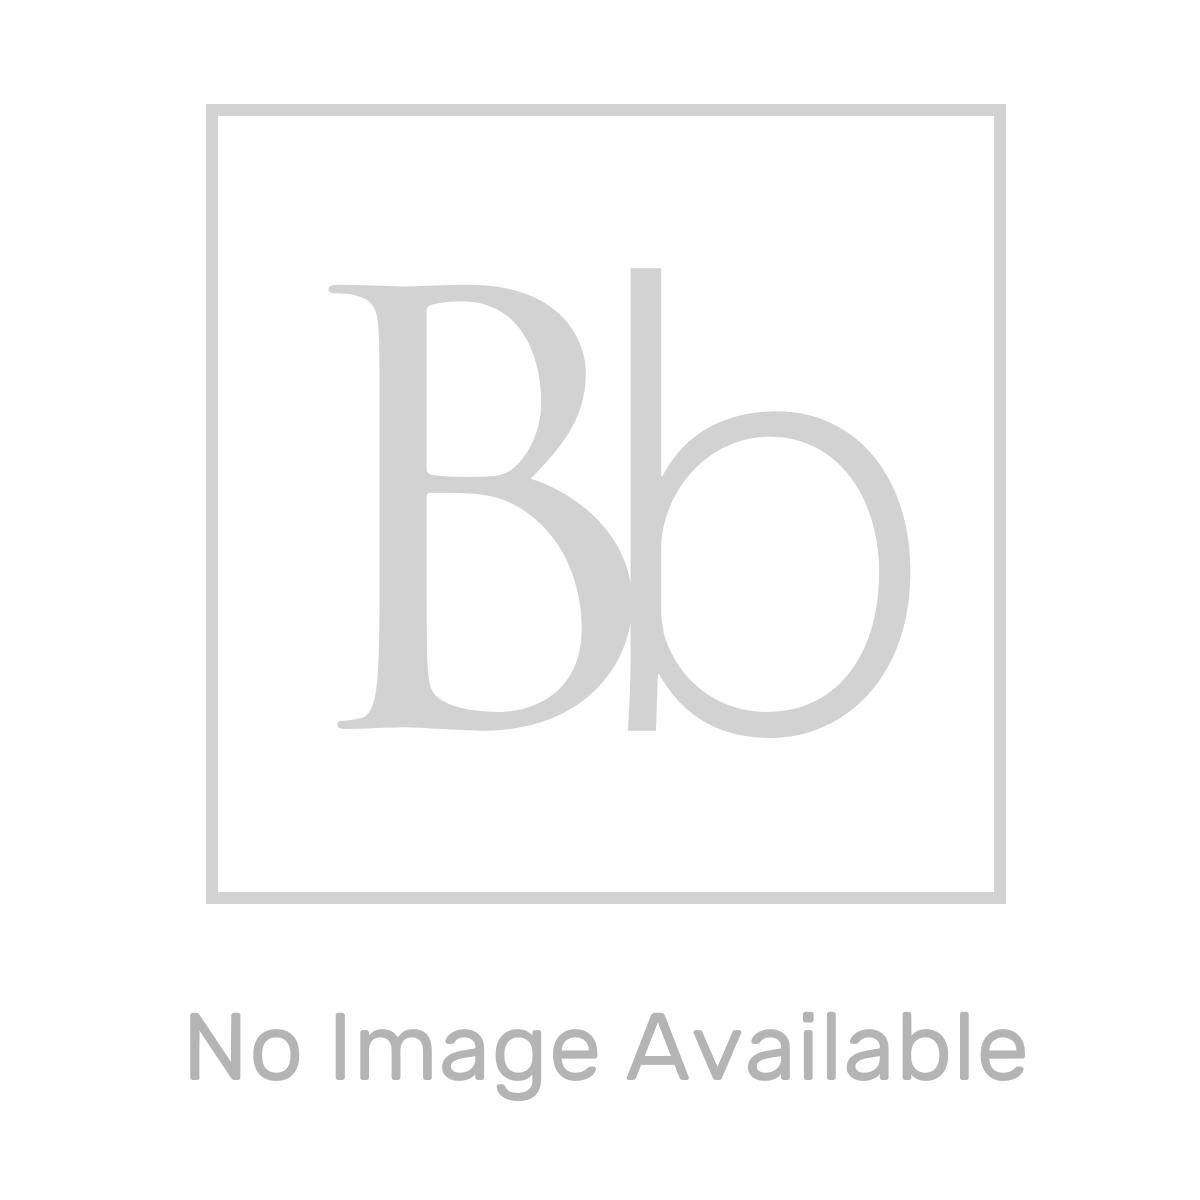 RAK Cubis Black Towel Shelf Measurements